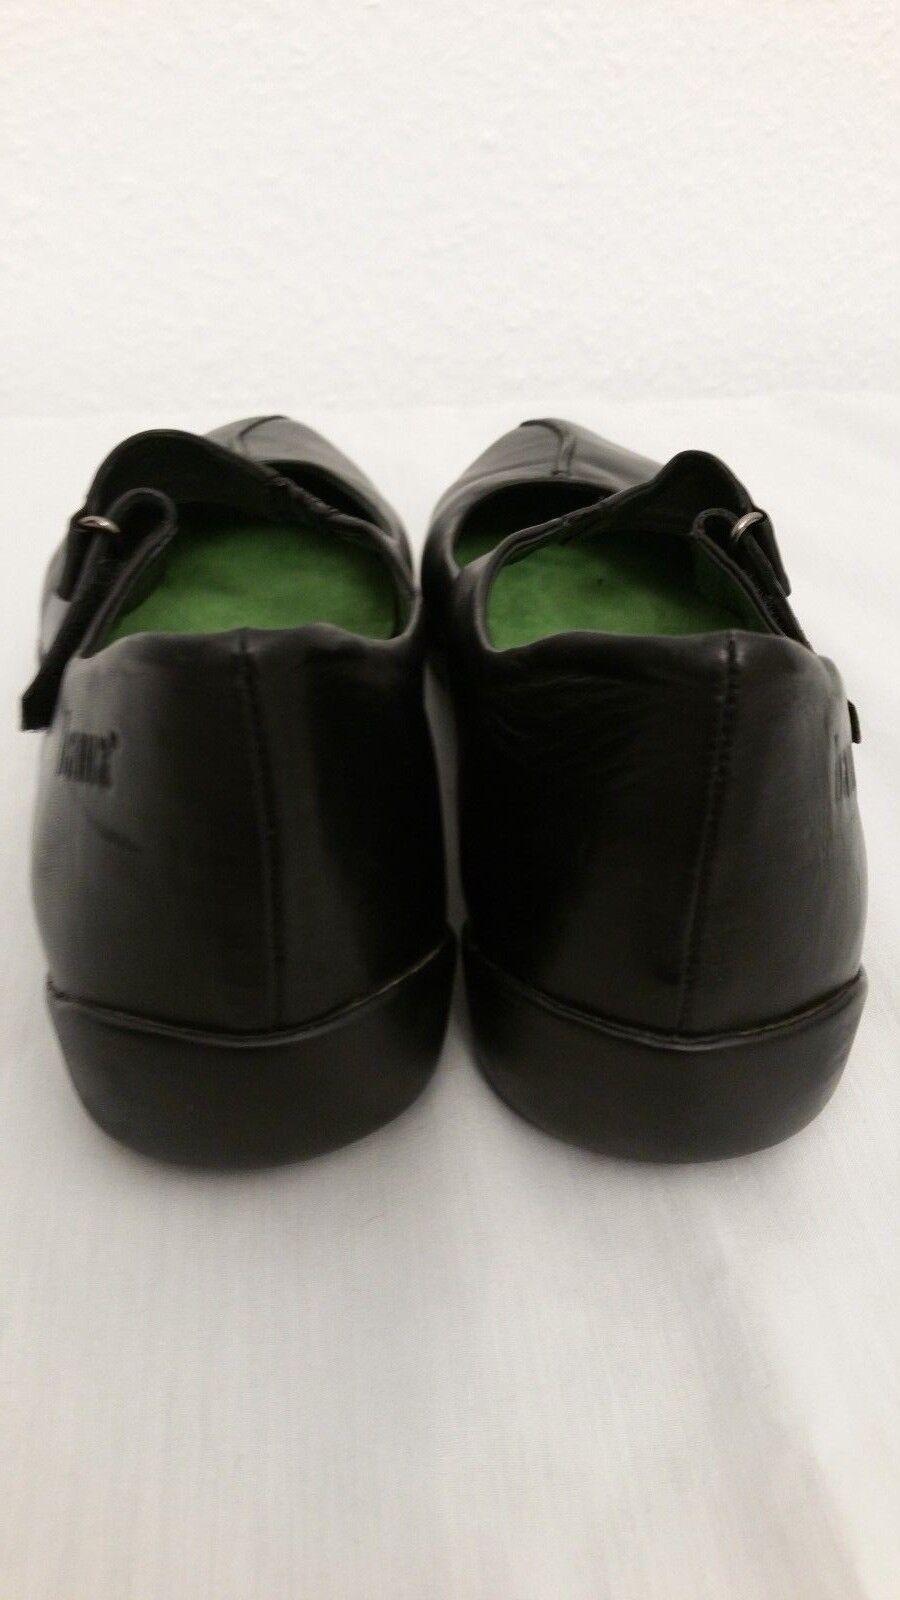 1244---Bama Schuhe Leder Gr schwarz 39 schwarz Gr Leder,neu c37836